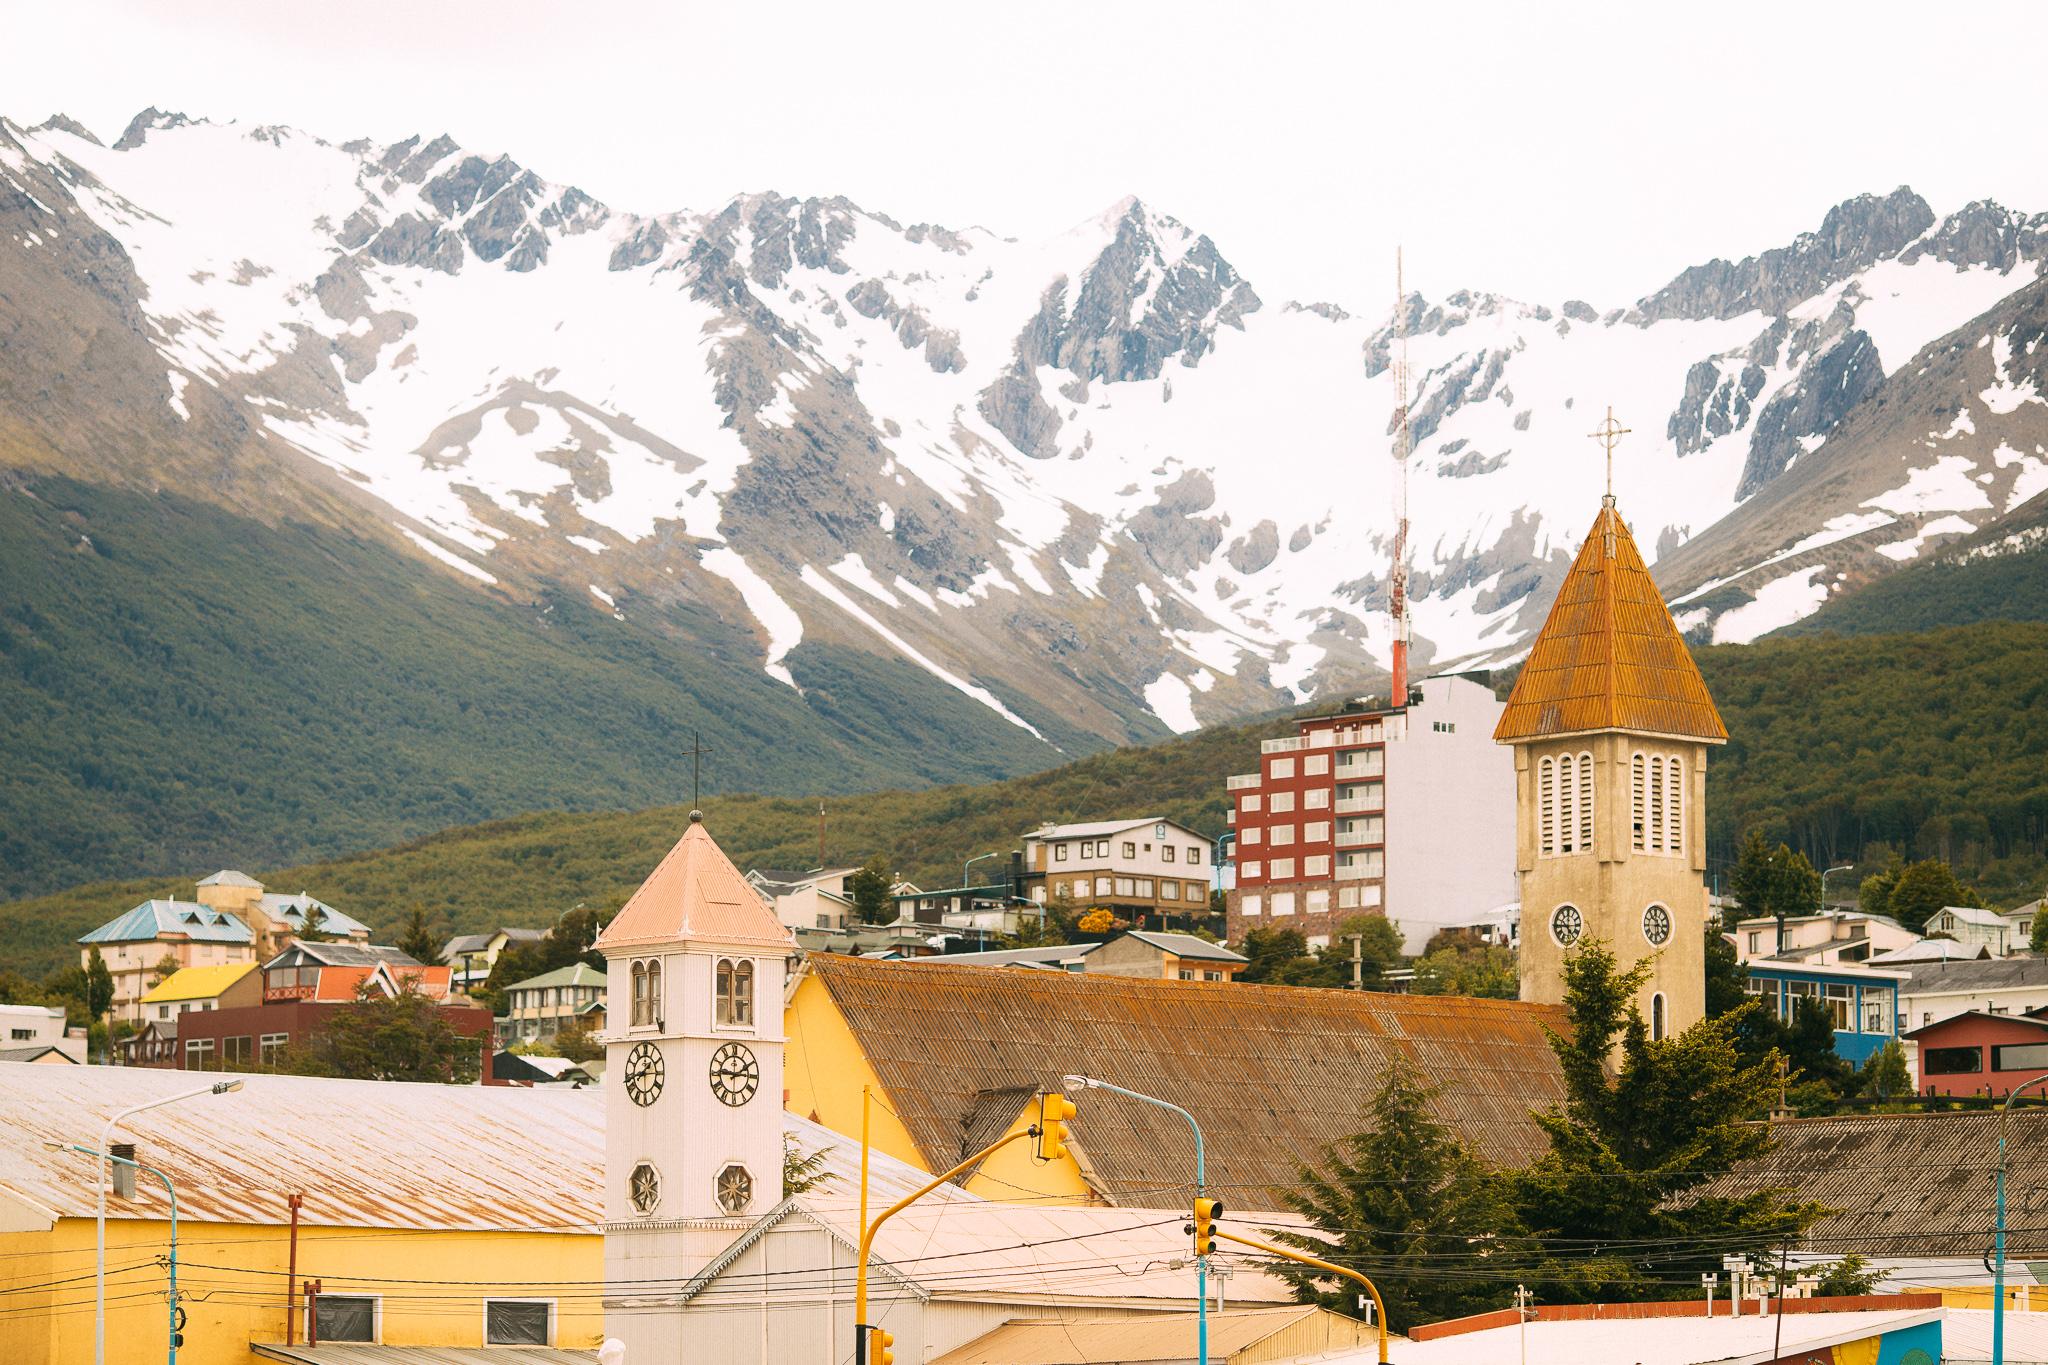 wedding-travellers-destination-wedding-argentina-fin-del-mundo-end-world-ushuaia-mountains-city-view